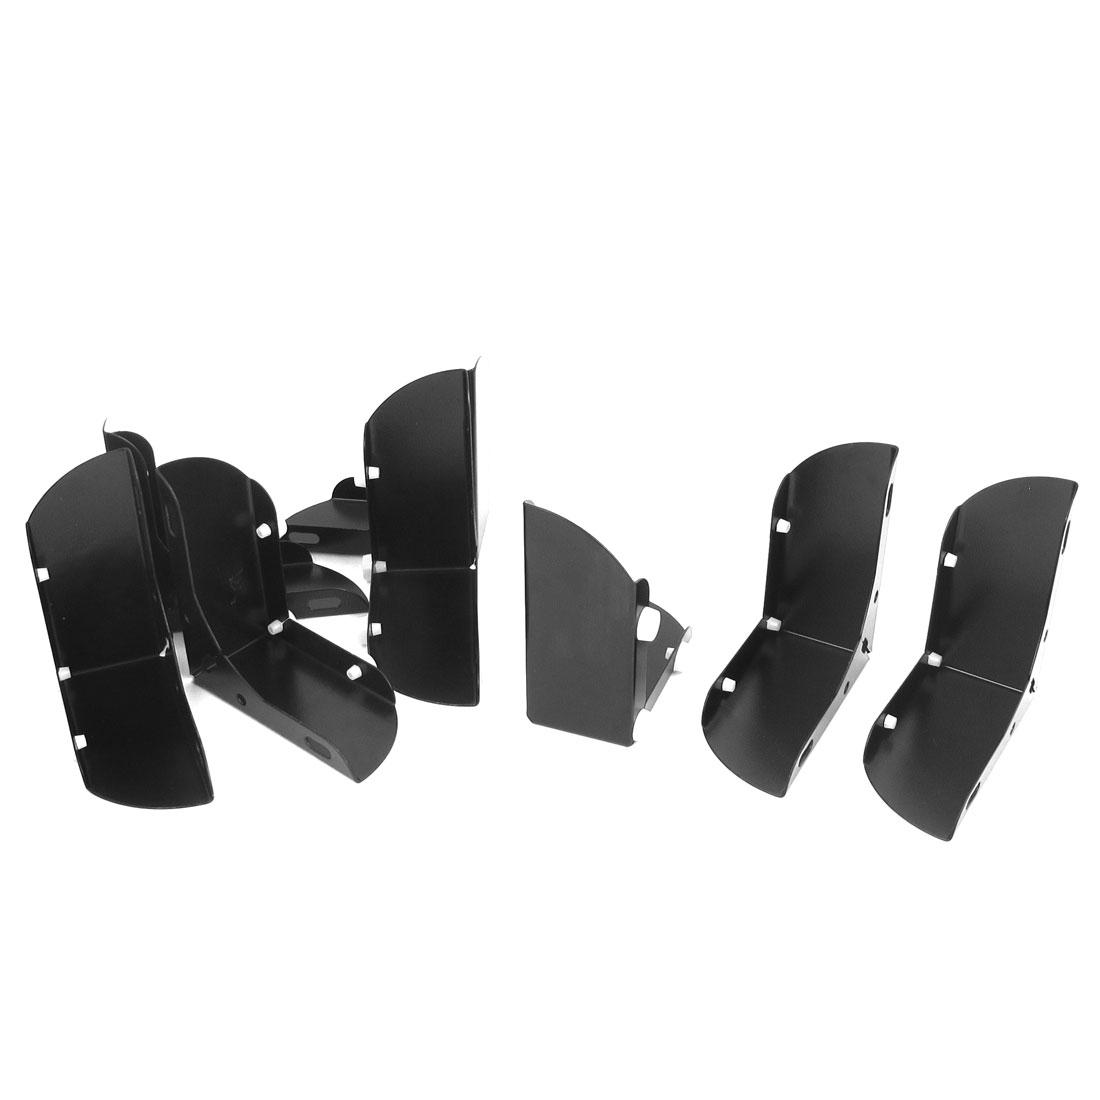 46mm Inner Height Furniture Feet Cabinet Sofa Leg Decor Black 8pcs